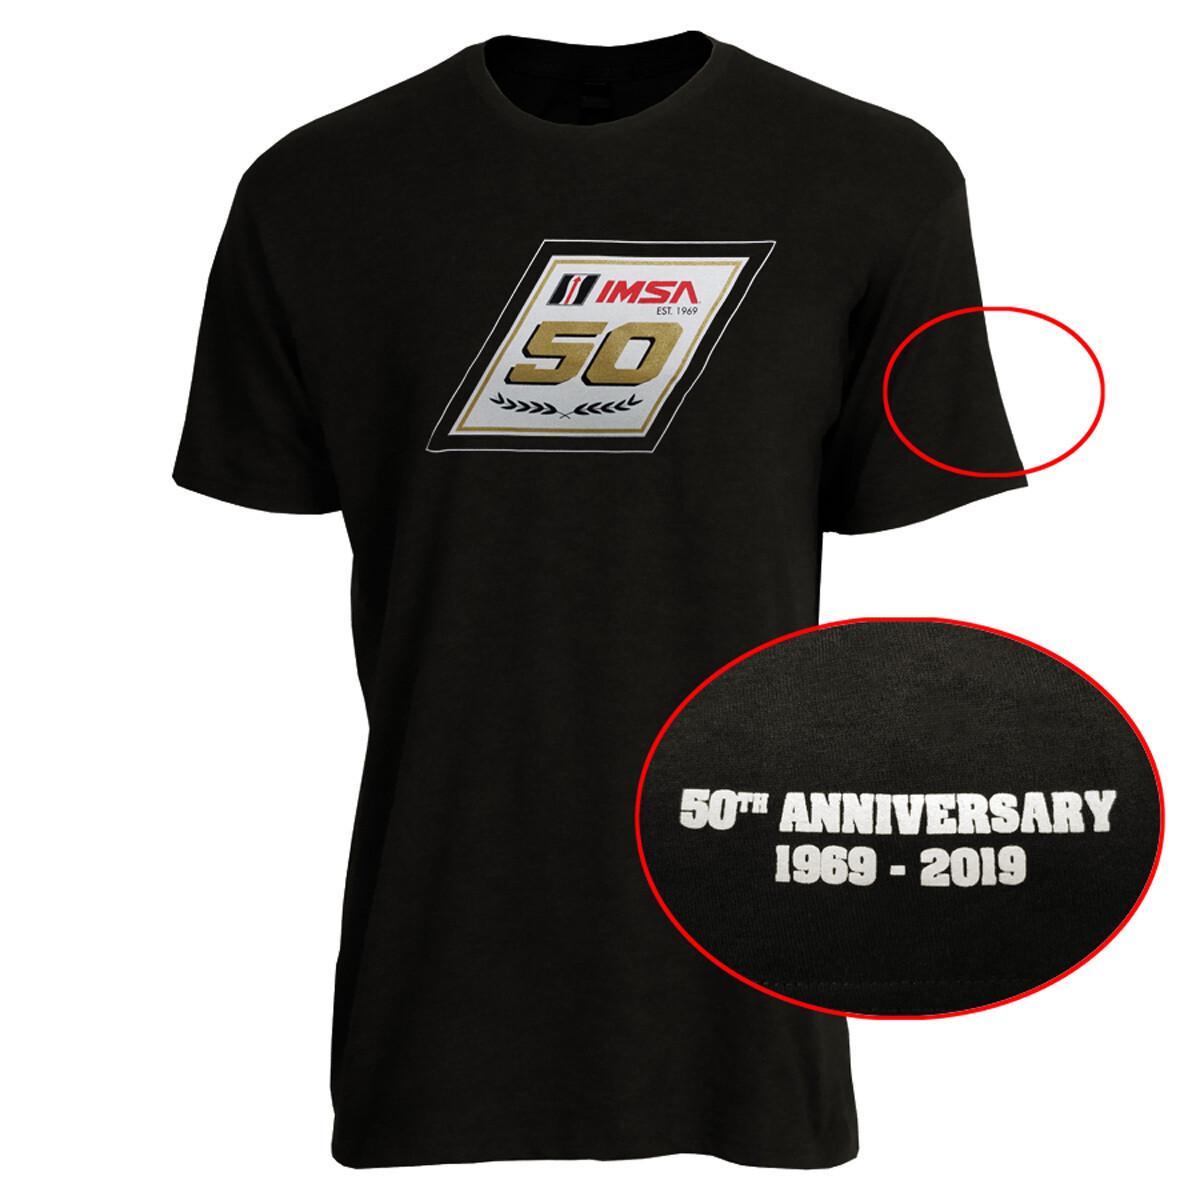 IMSA 50th Anniversary Metallic Gold Logo Tee- Vintage Black